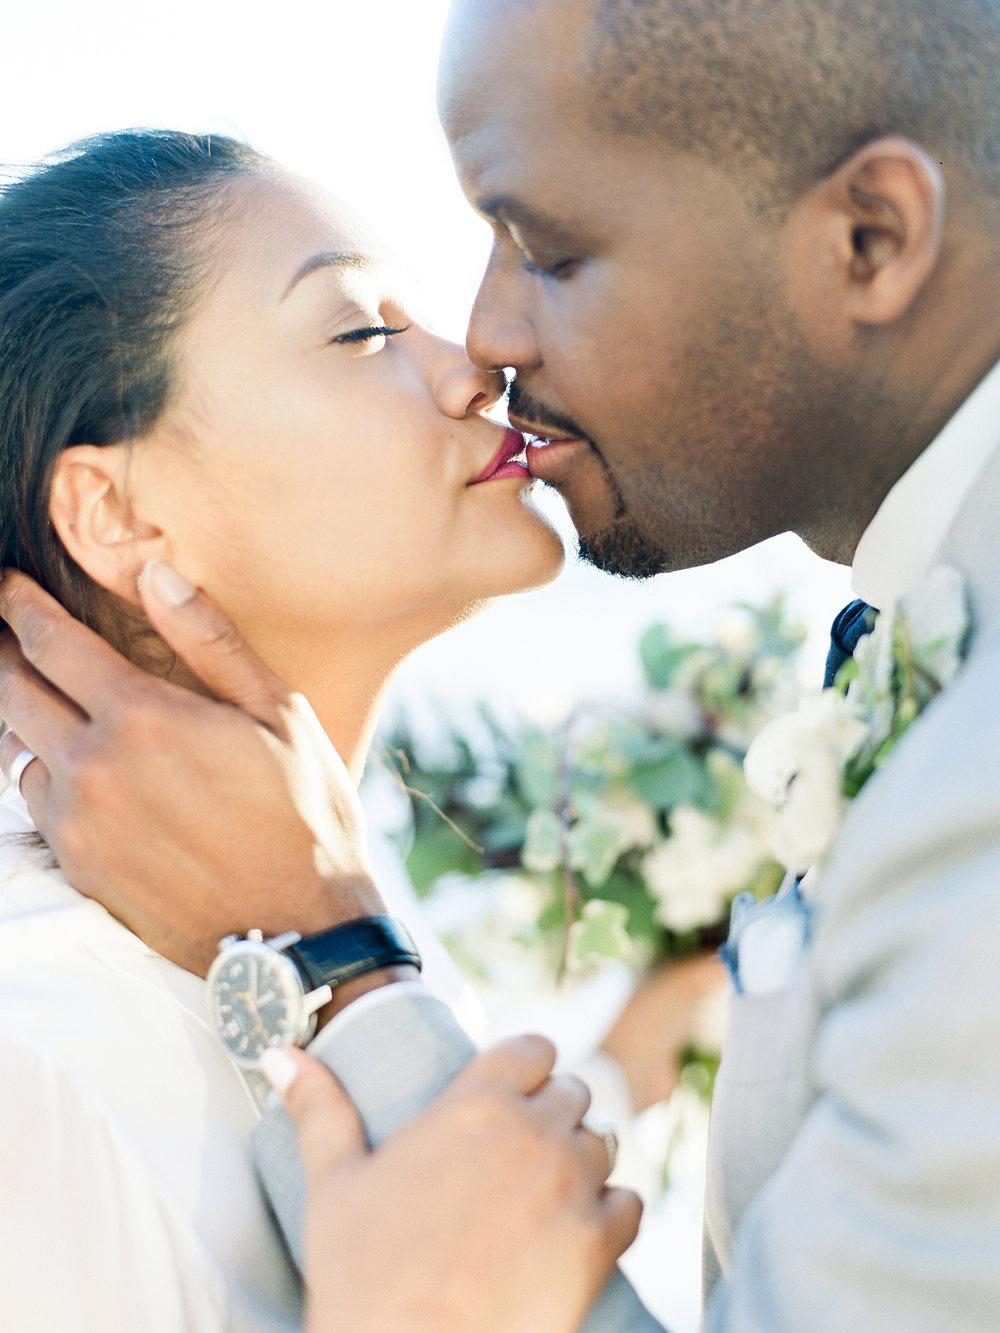 casandra_and_andy_carillon_beach_wedding_photographer_shannon_griffin_bride_and_groom-39 (1).jpg